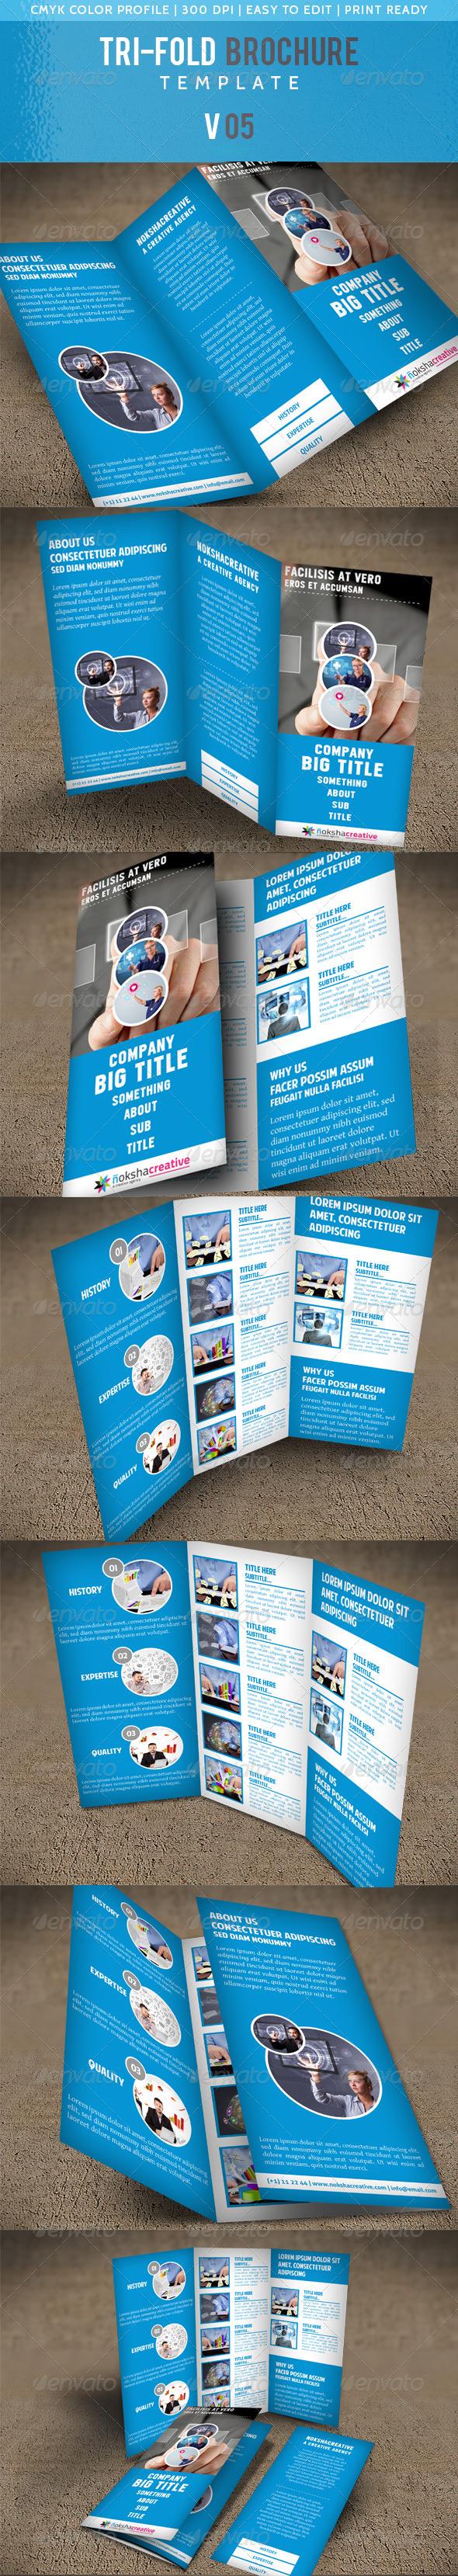 Corporate Tri-Fold Brochure V 05